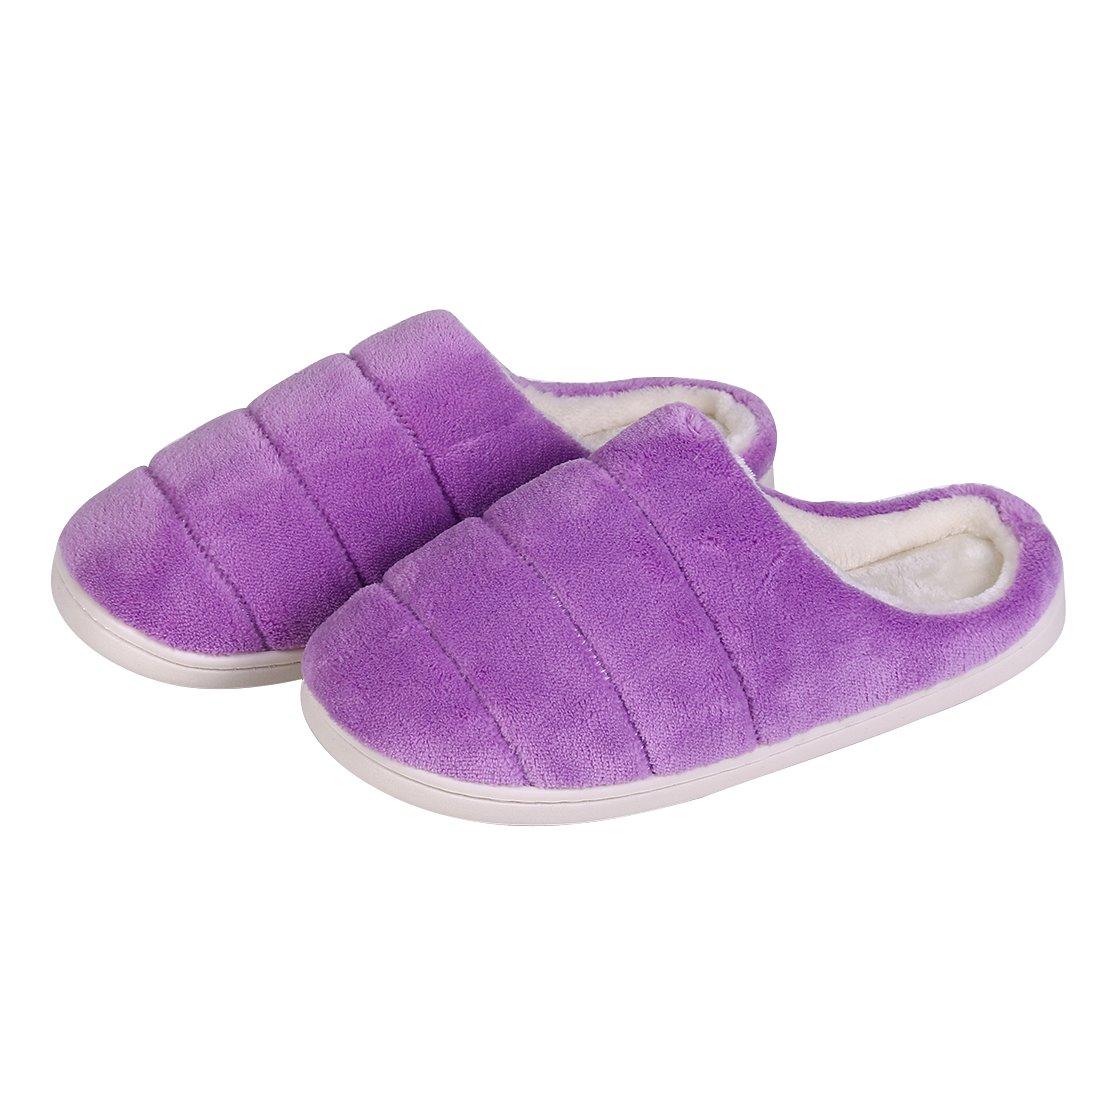 Buganda Women's Soft Winter Warm Memory Foam Coral Fleece House Slippers Slip On Home Plush Lining Slippers